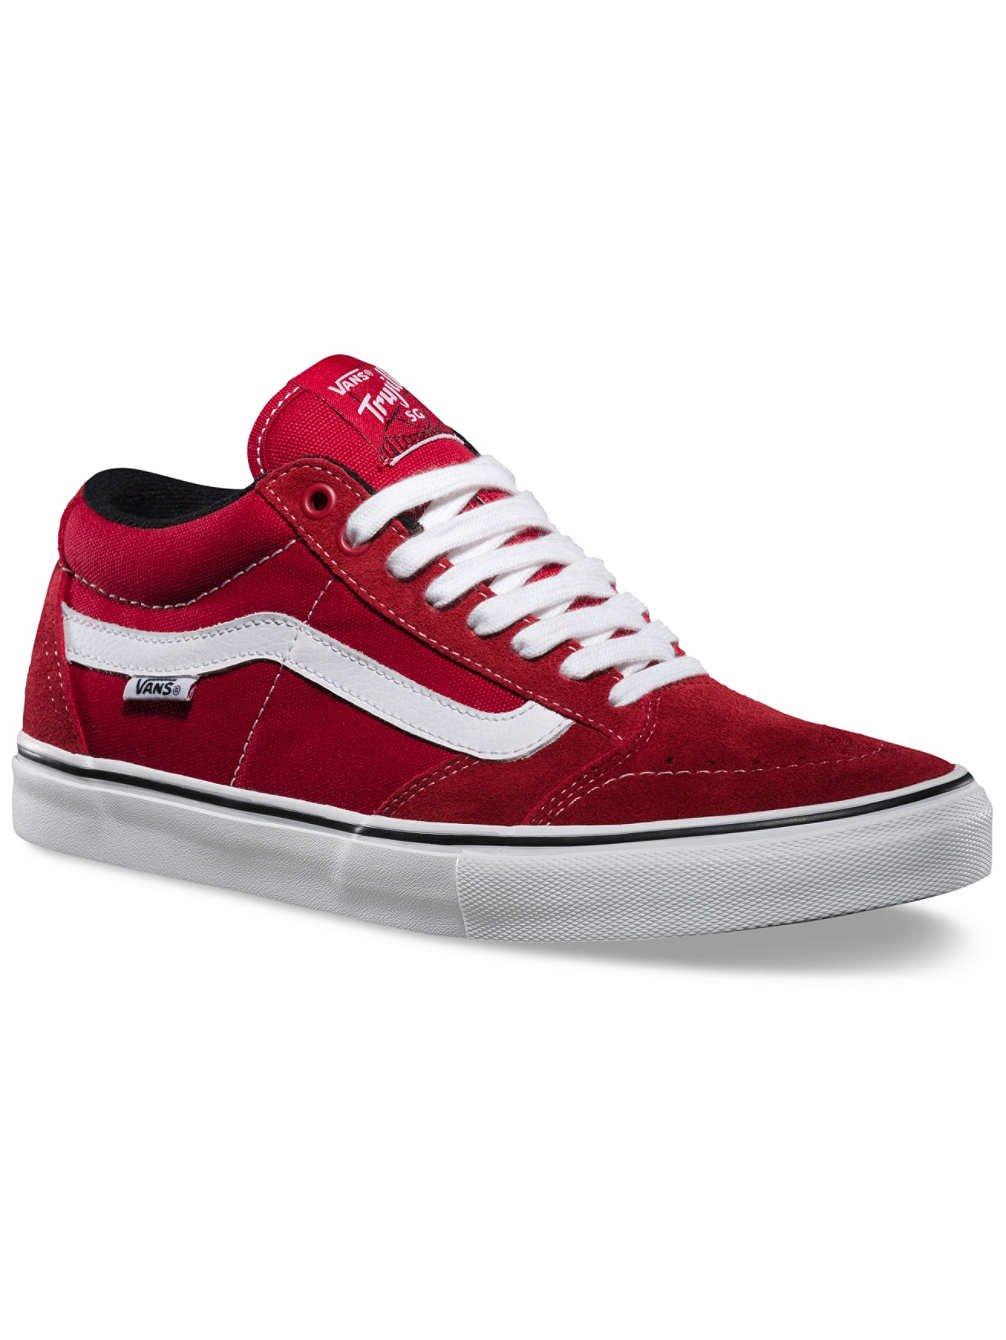 3b8d40532b Vans TNT SG Scarlet Red White Mens Sneakers (6.5 Mens) free shipping ...